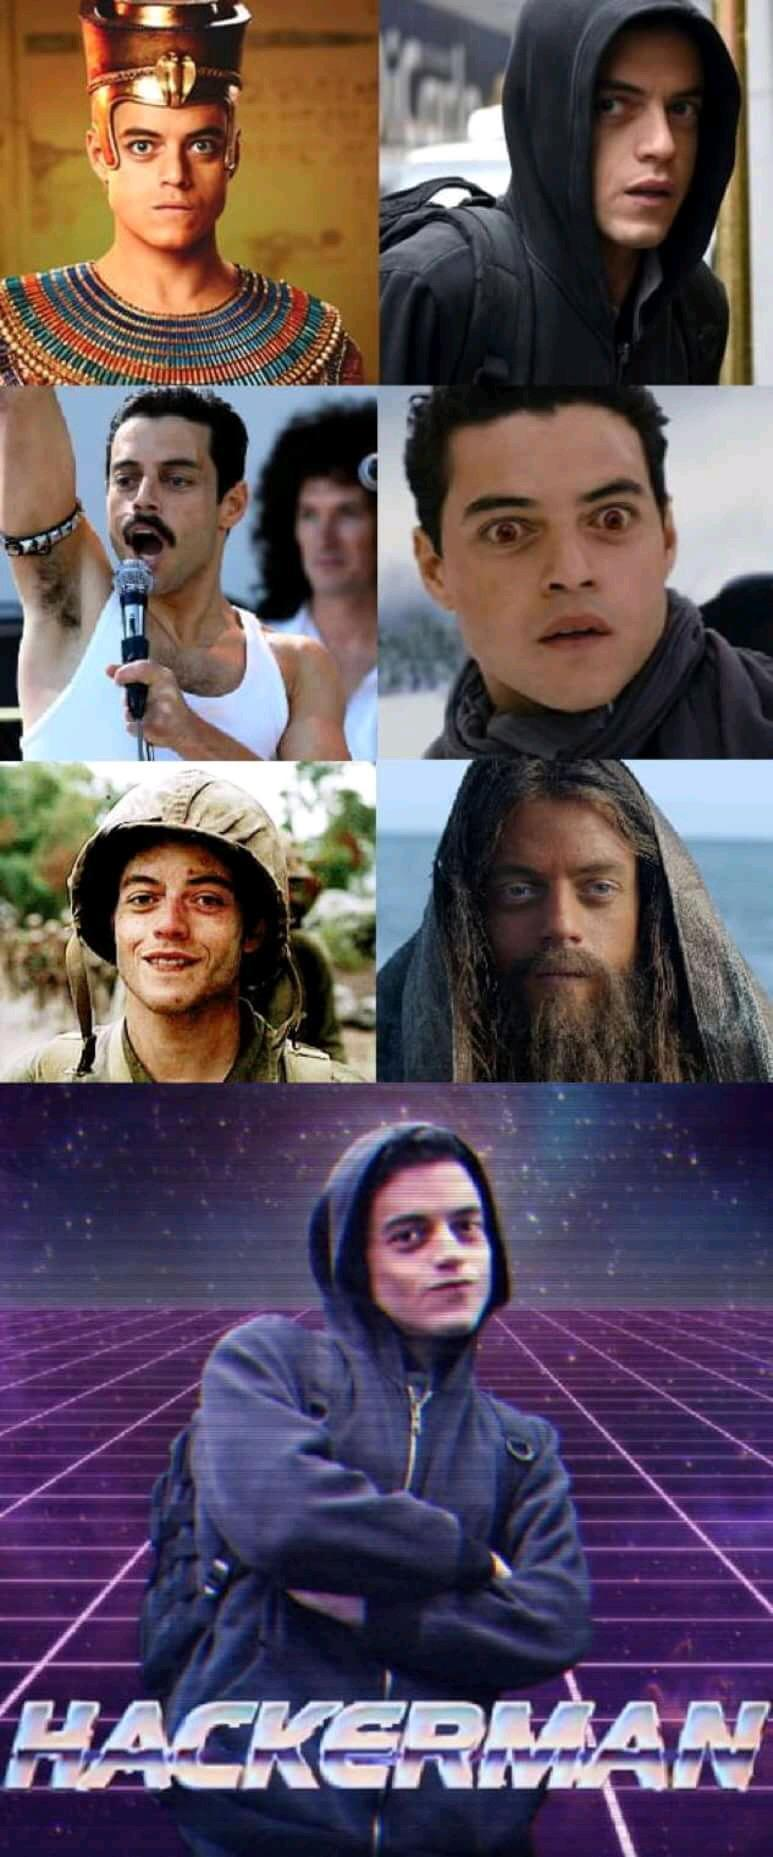 Rami Malek and all his faces - meme